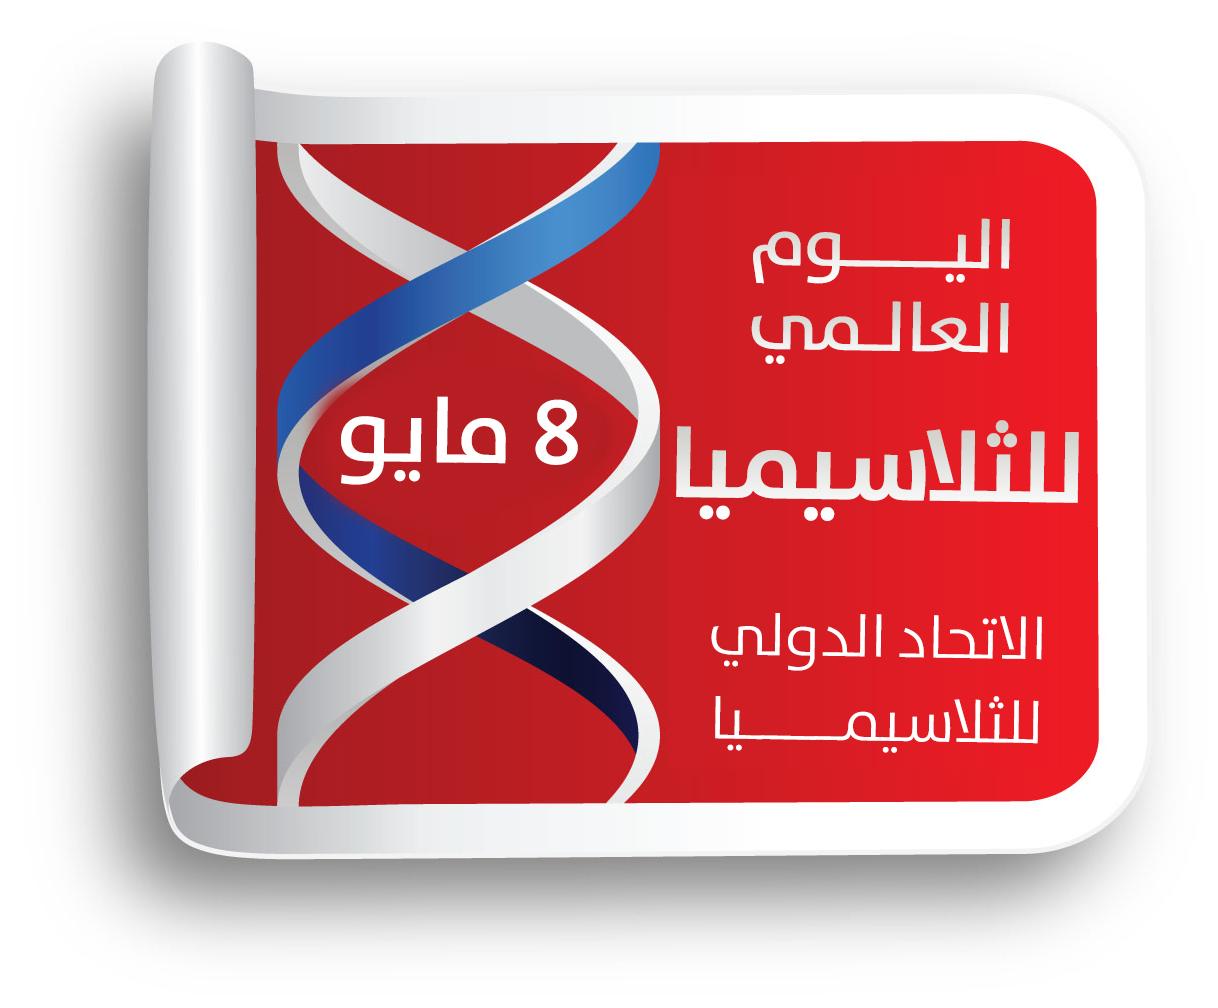 thalassemia day